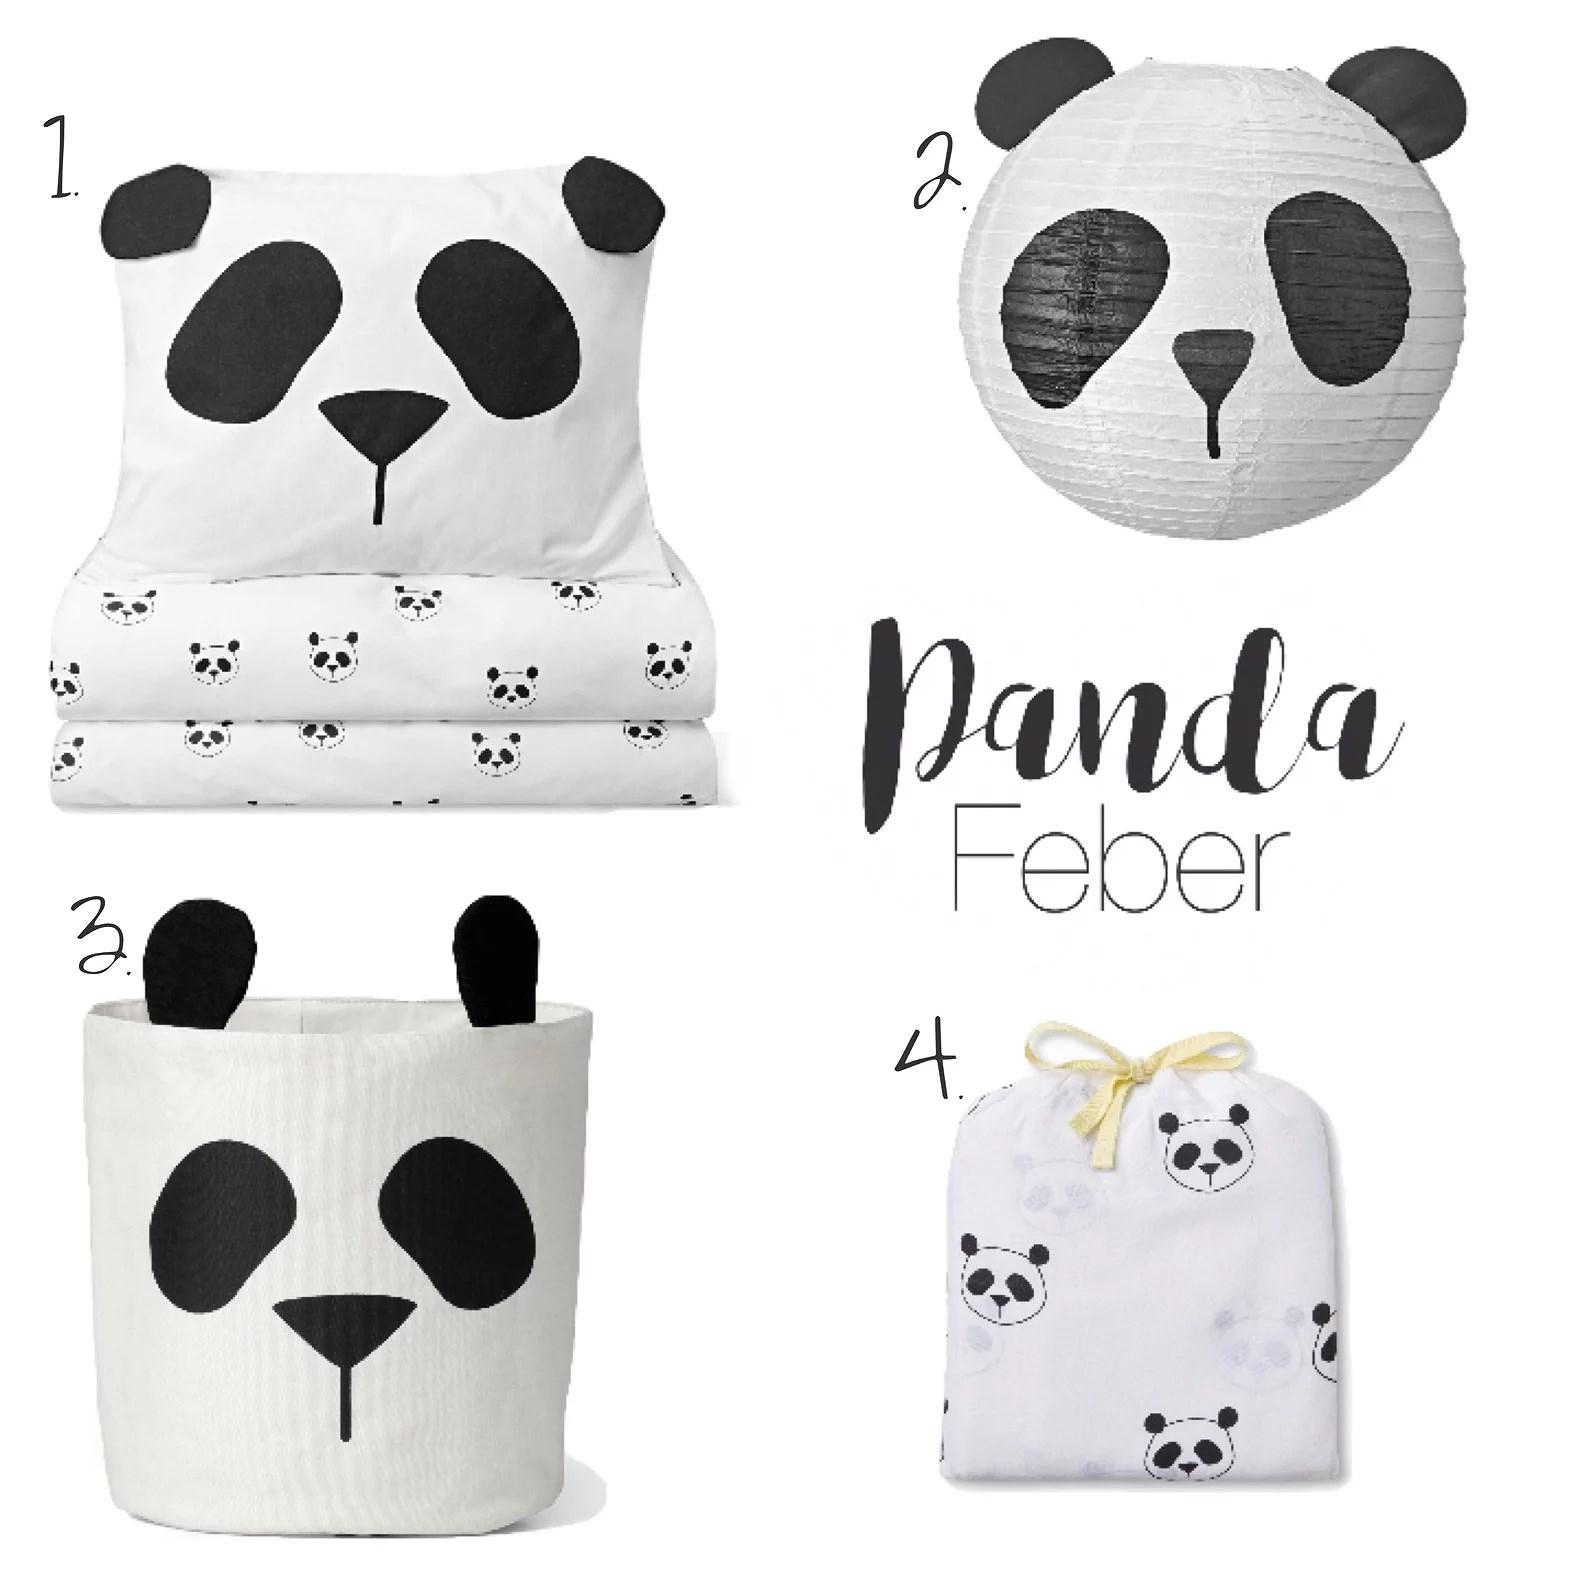 Pandafeber